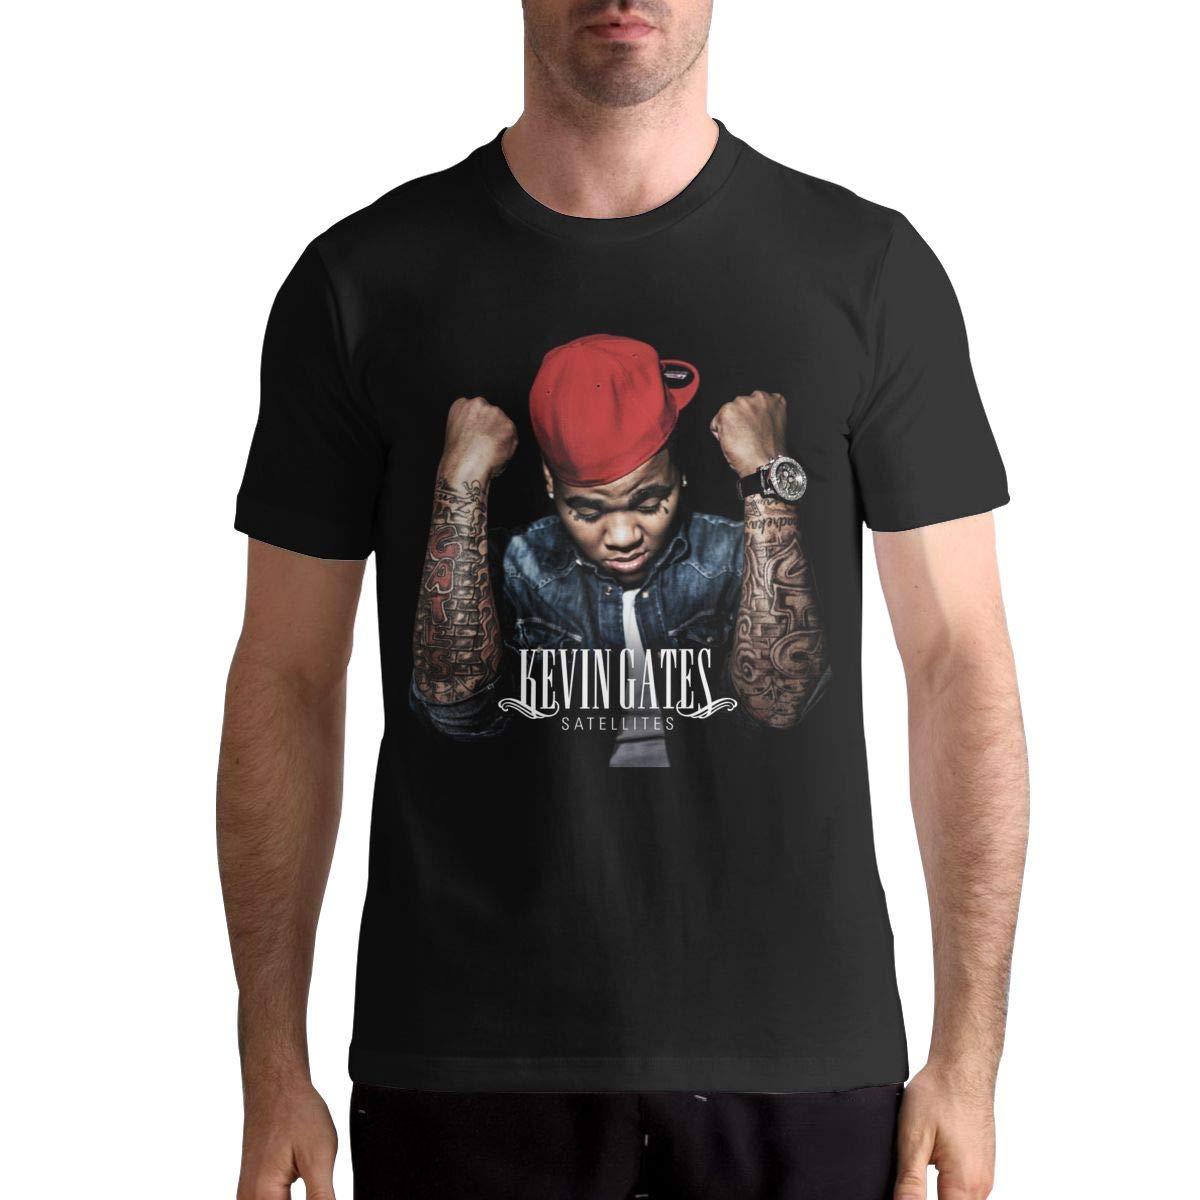 Kevin Gatessatellites S Fashion Short Sleeve Music Band Shirt Black